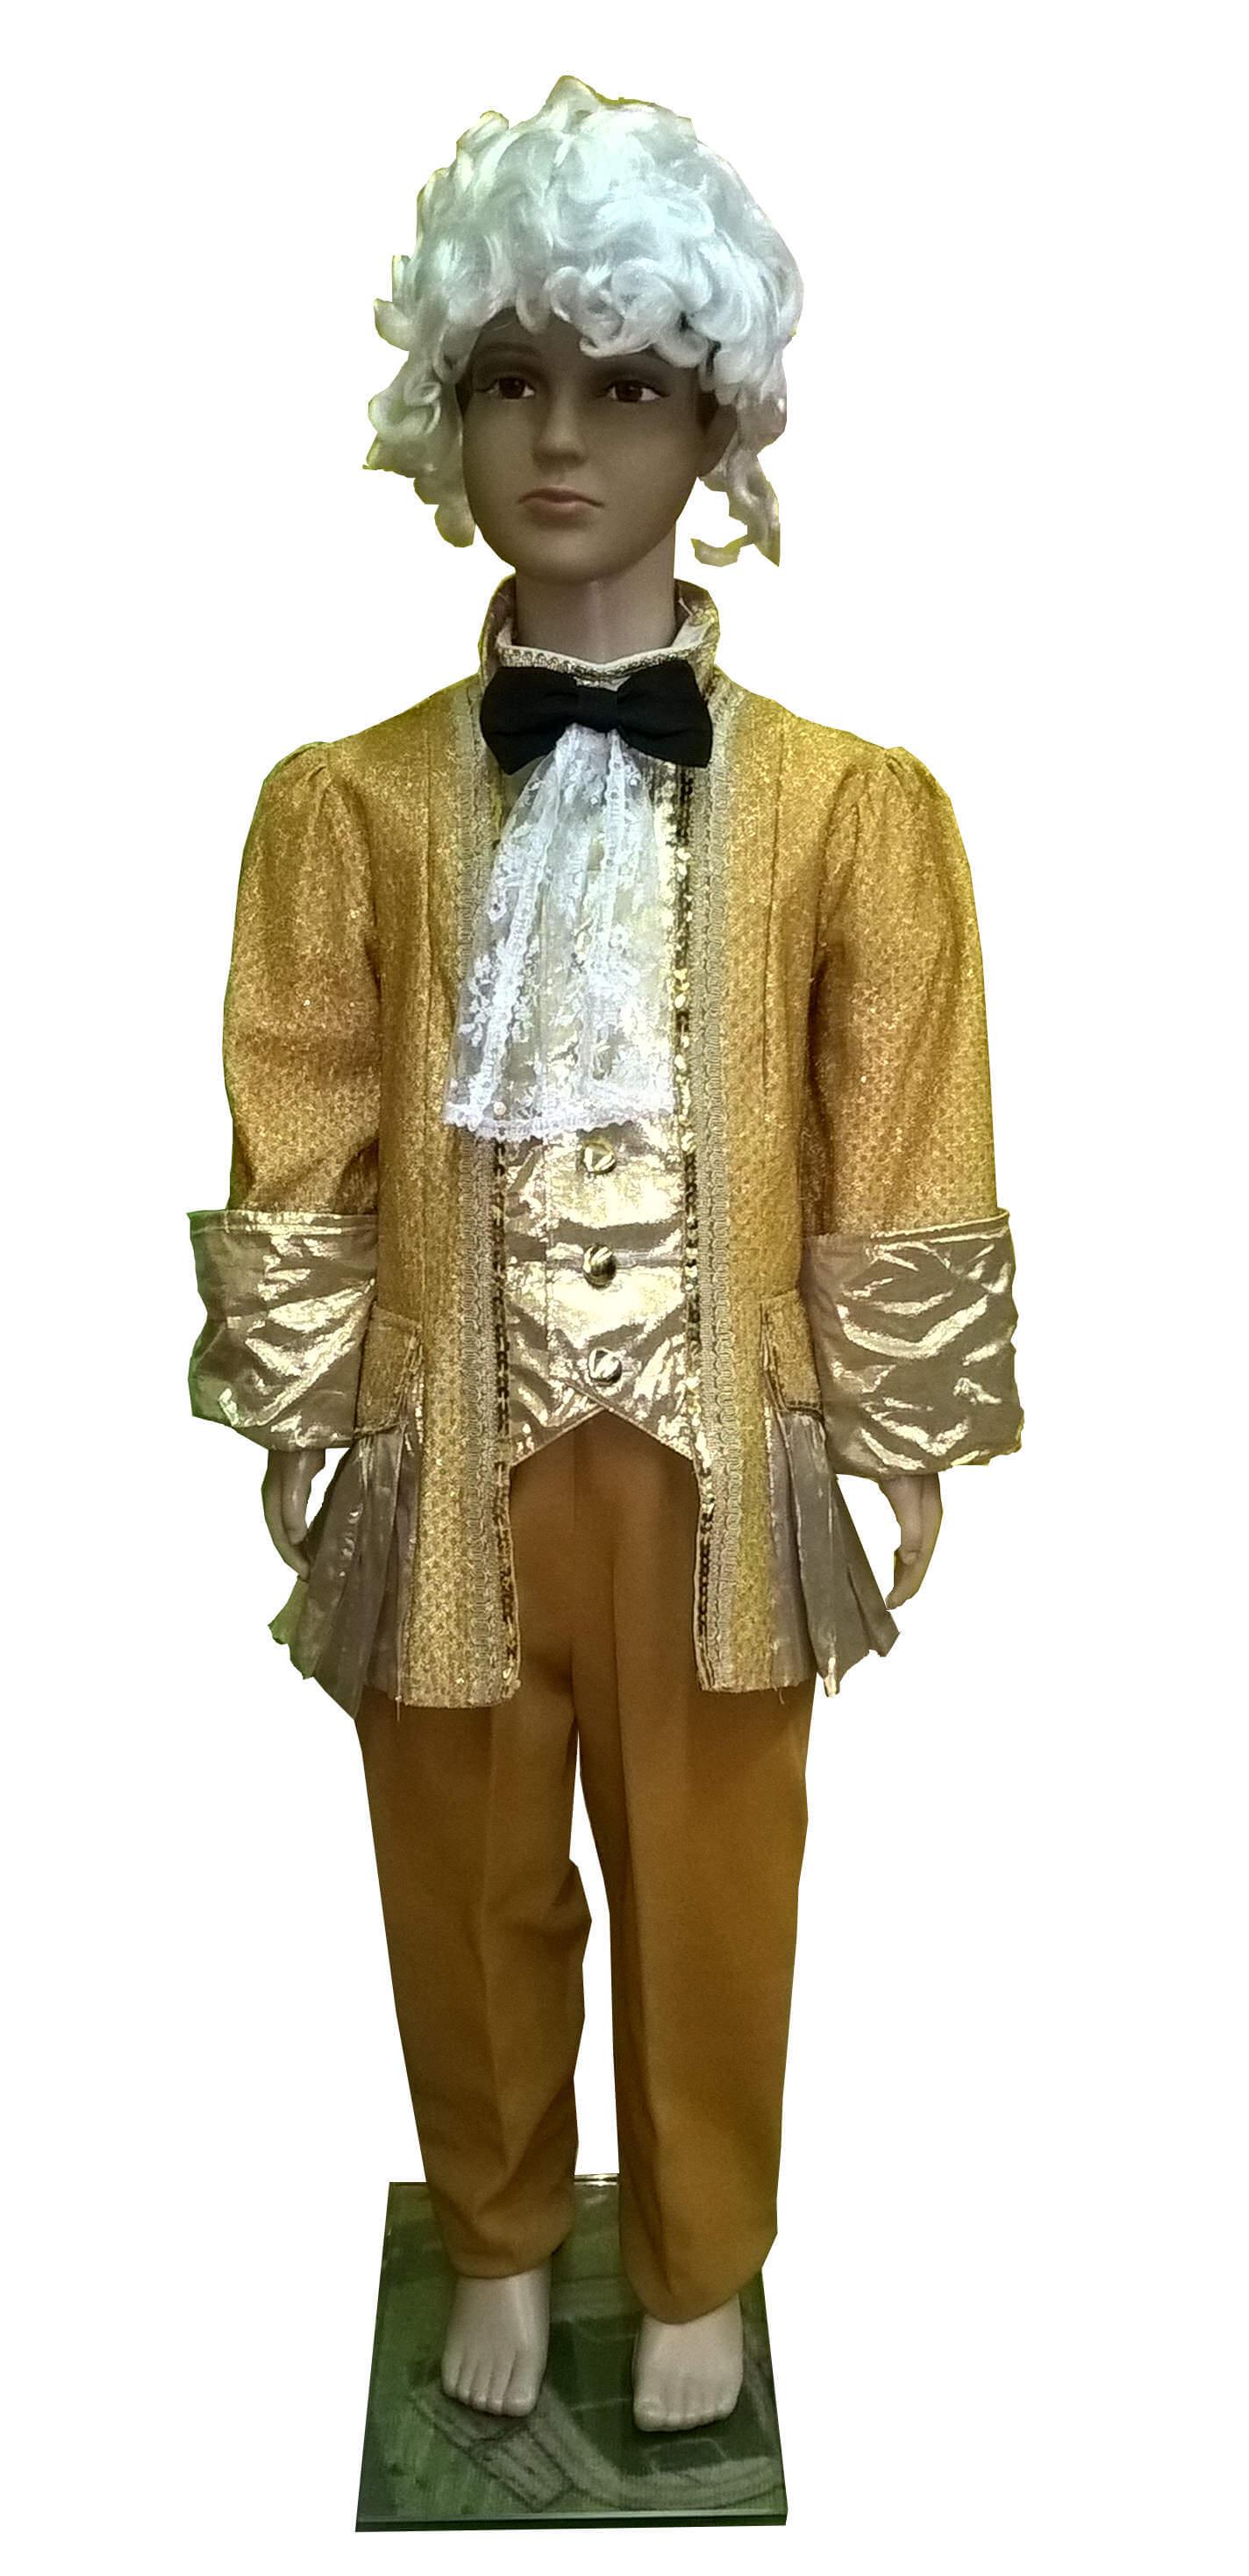 Dvariškio kostiumas. Kaina 15 Eur.